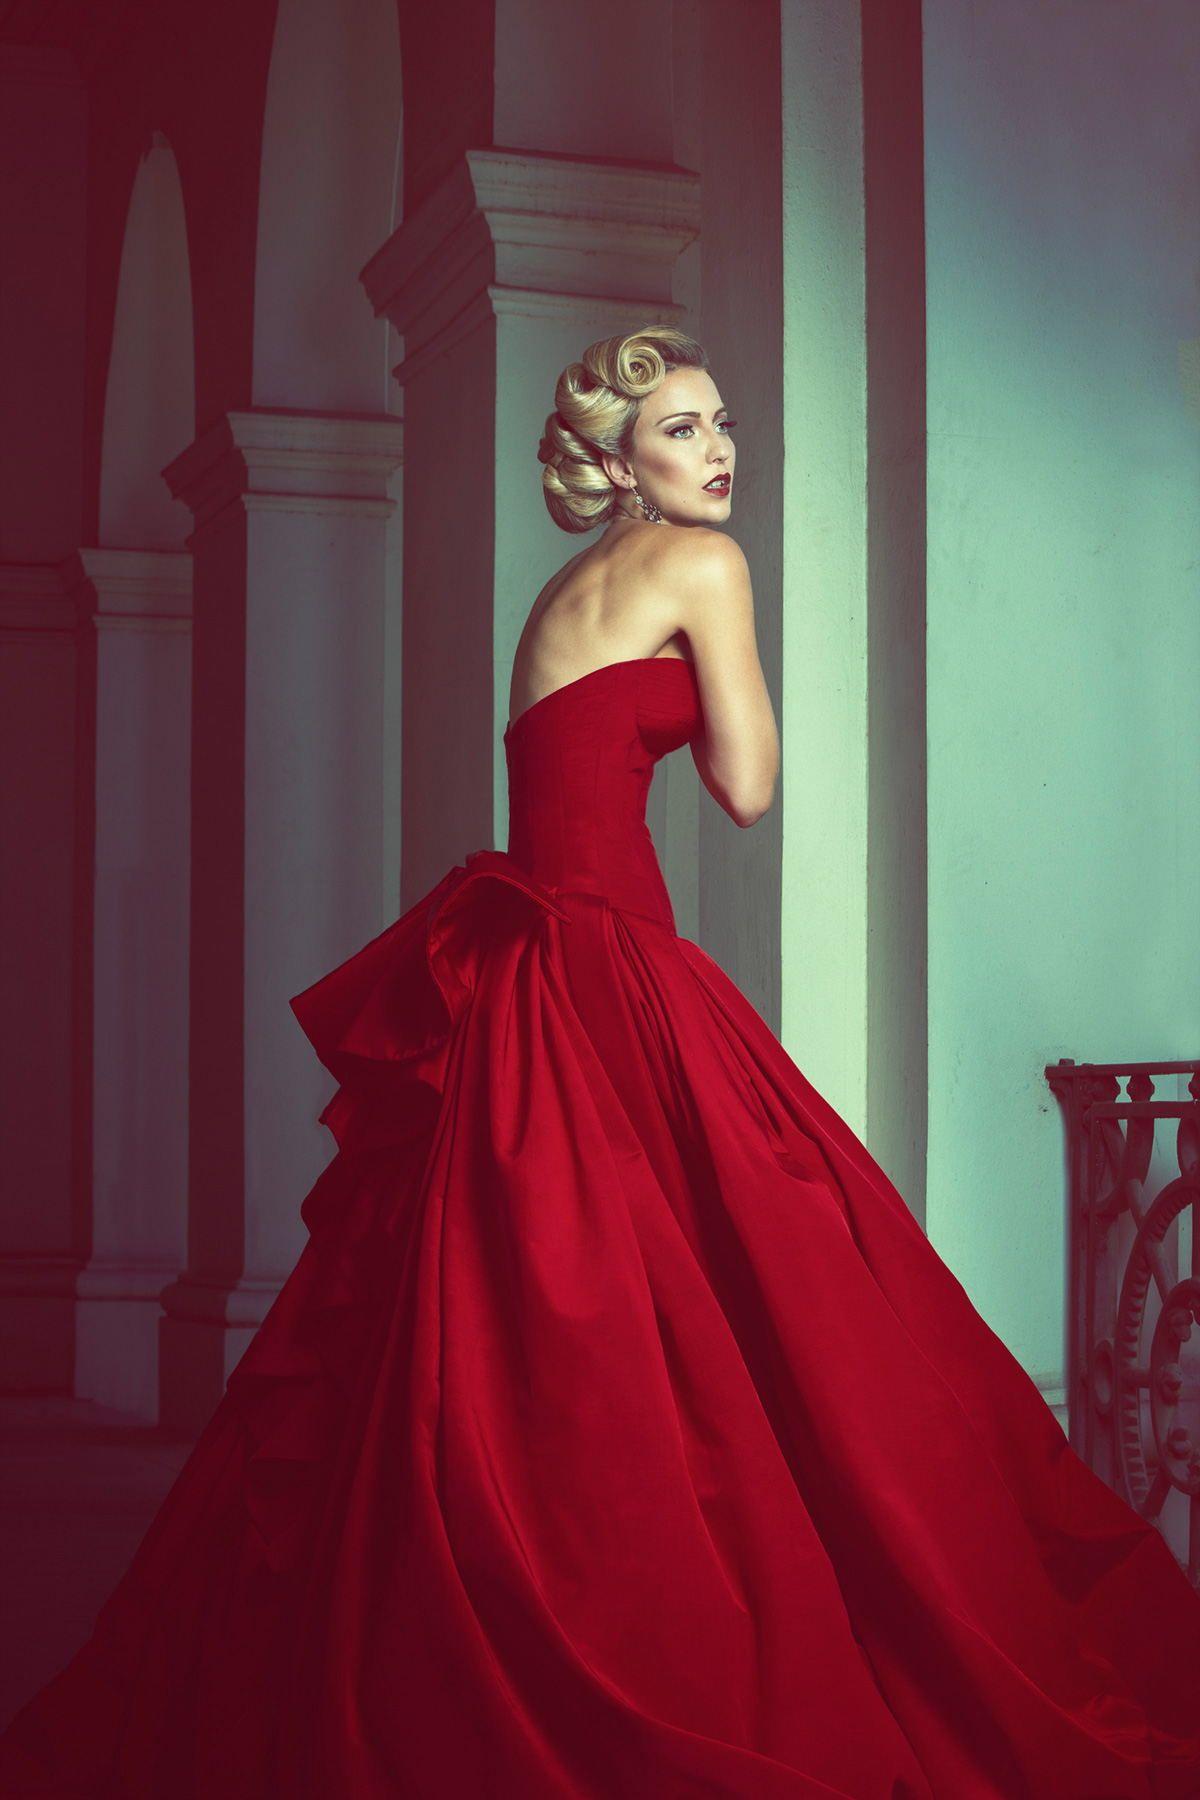 Red Dress At The Opera Red Dress Classy Dress Classic Red Dress [ 1800 x 1200 Pixel ]